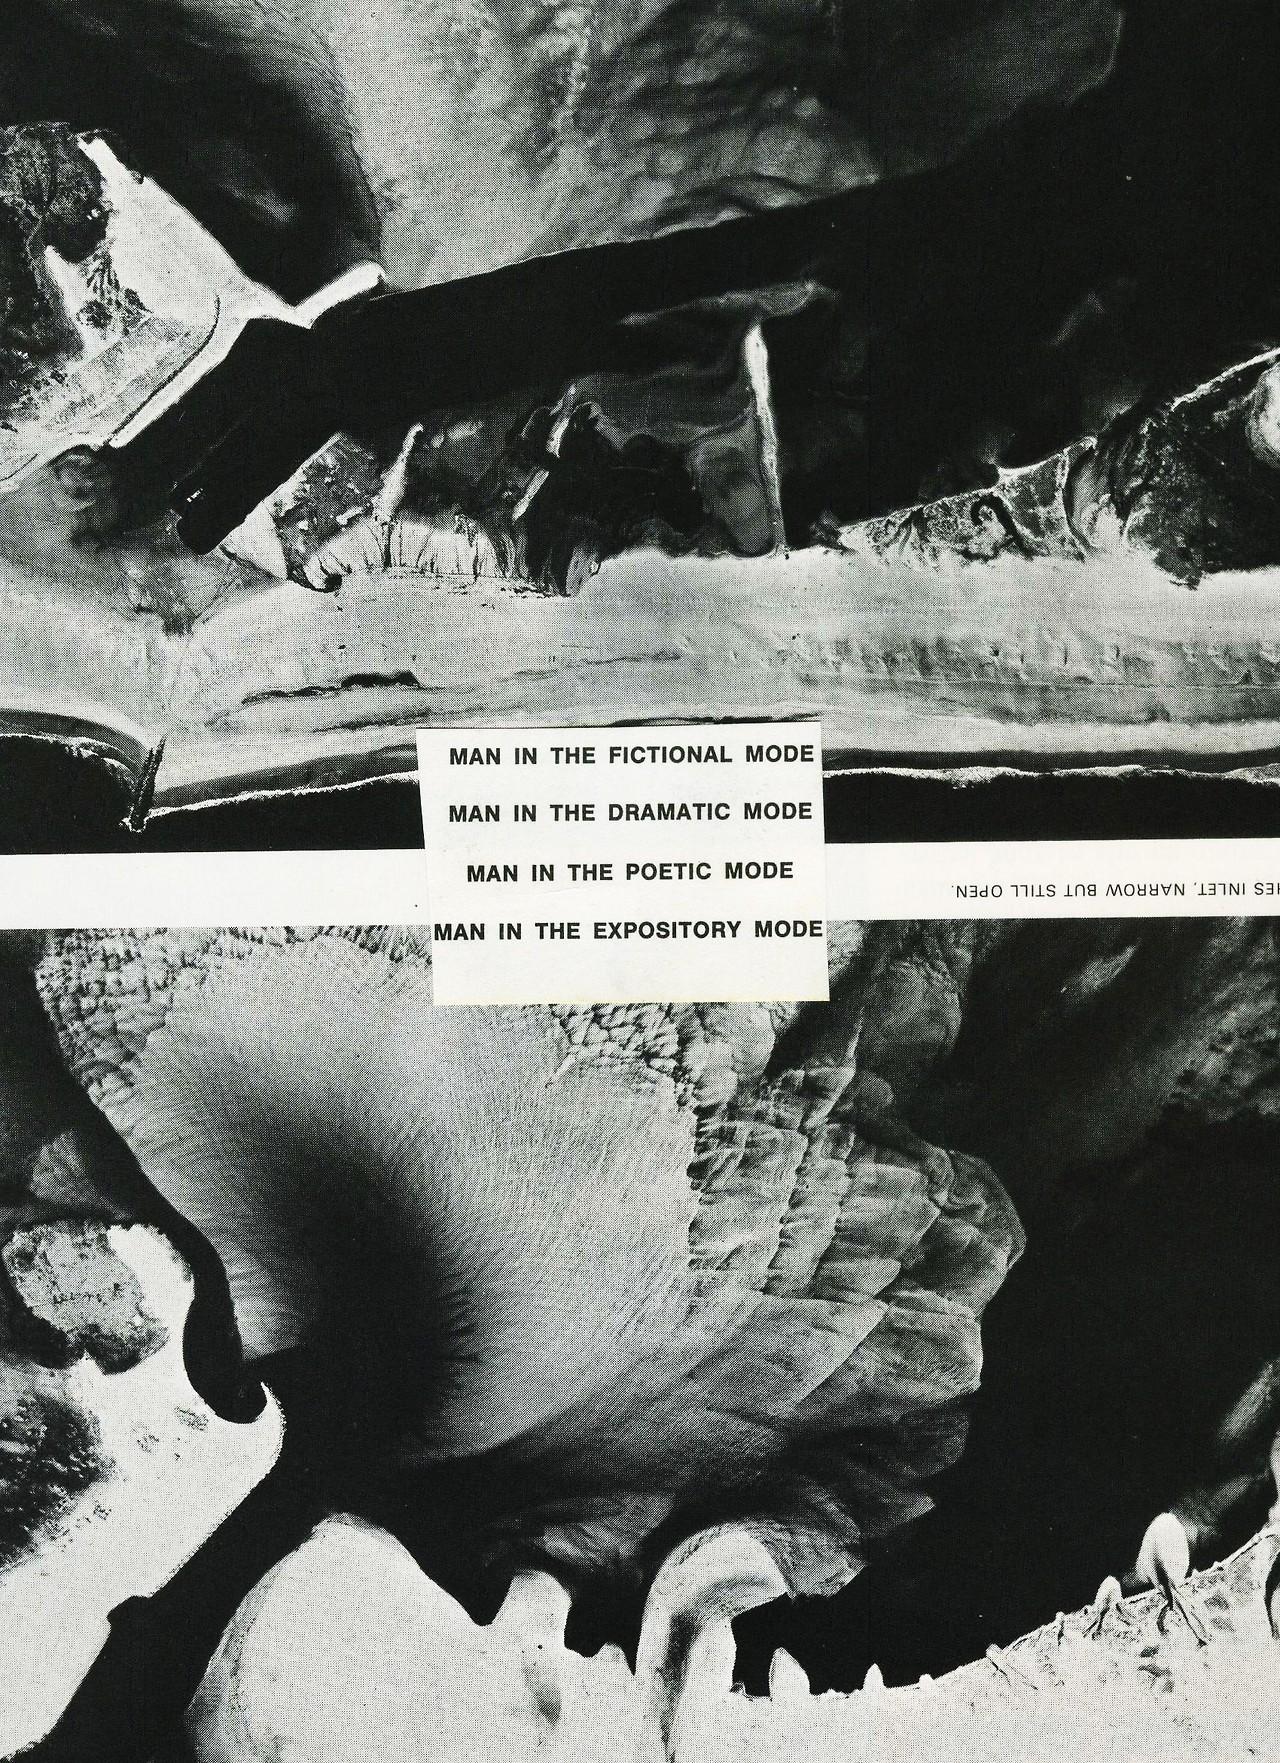 Modes by Natasha King (2013)